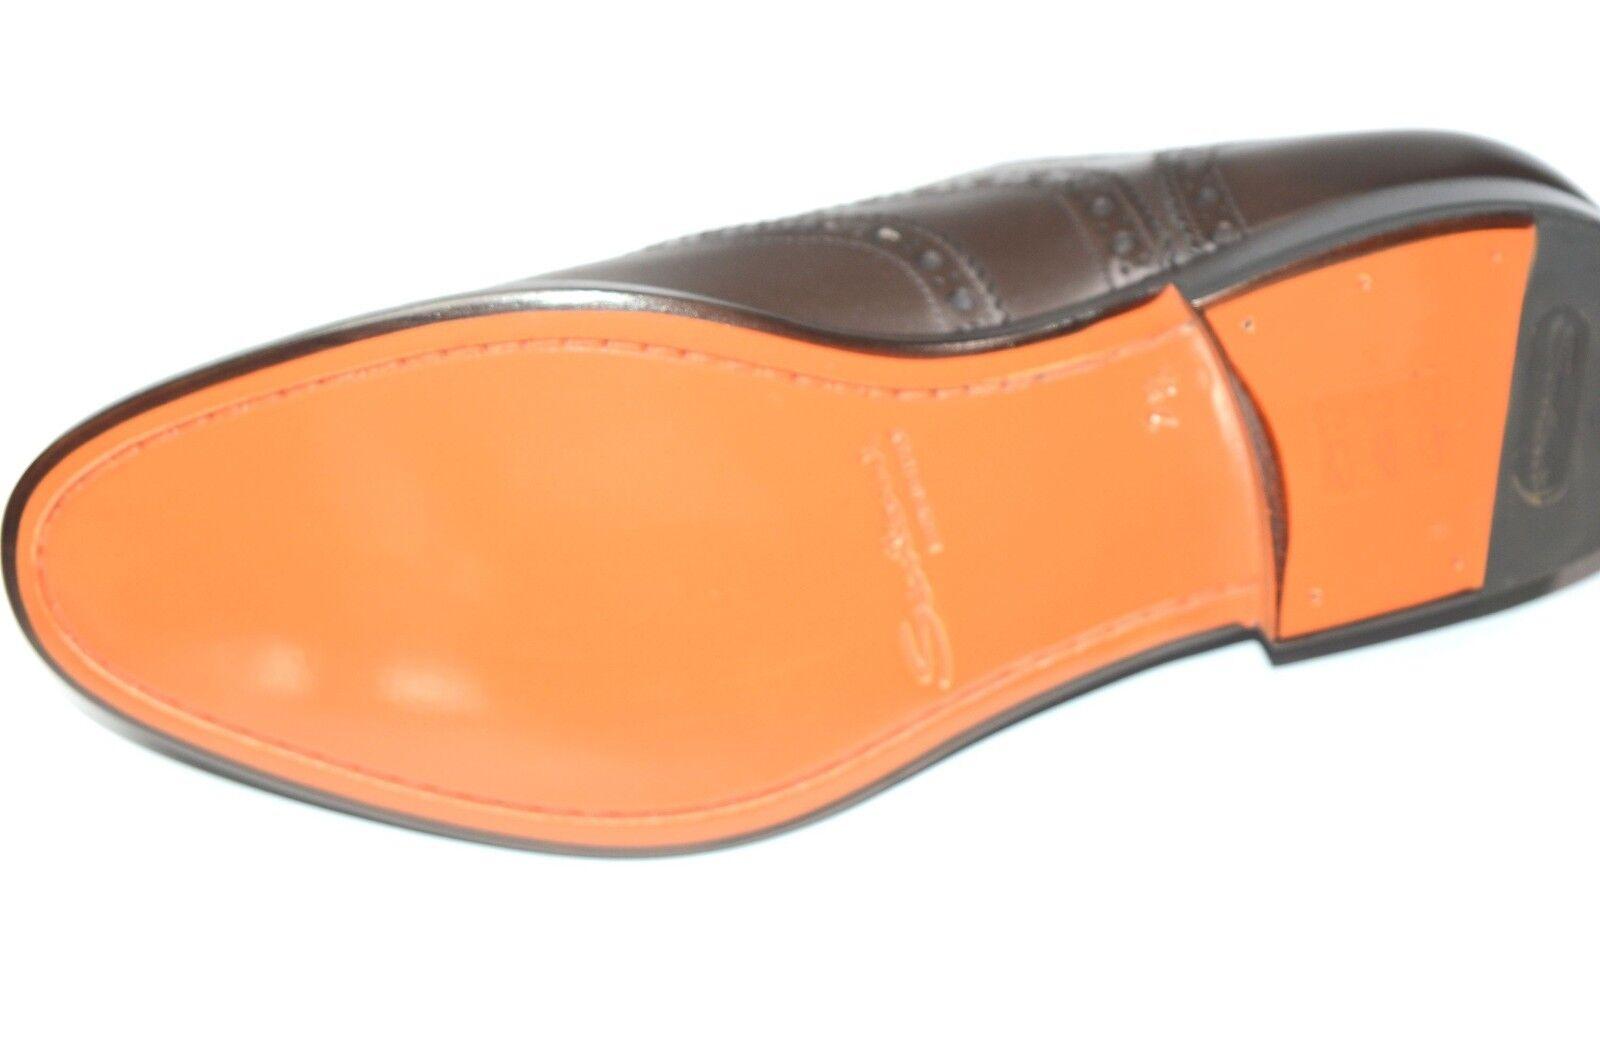 NEW NEW NEW SANTONI Dress Brown Pelle Shoes  SIZE Eu 46 Uk 12 Us 13 (50R) 099a30